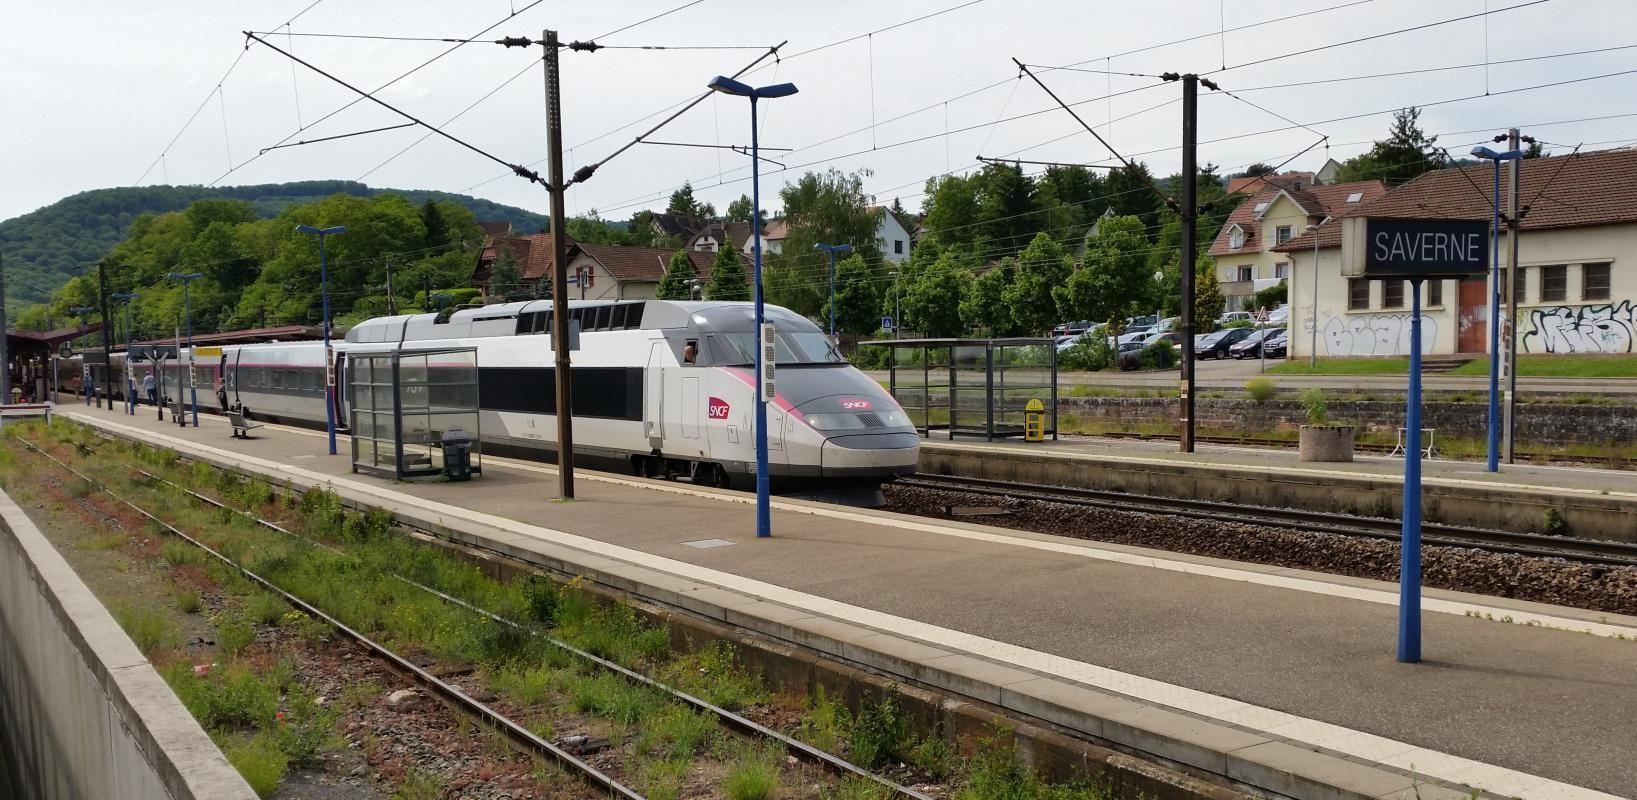 Gare TGV a 1 km du gîte : Strasbourg en train direct en 25 minutes, Paris en TGV à environ 2h, lignes Metz-Nancy, Bâle...